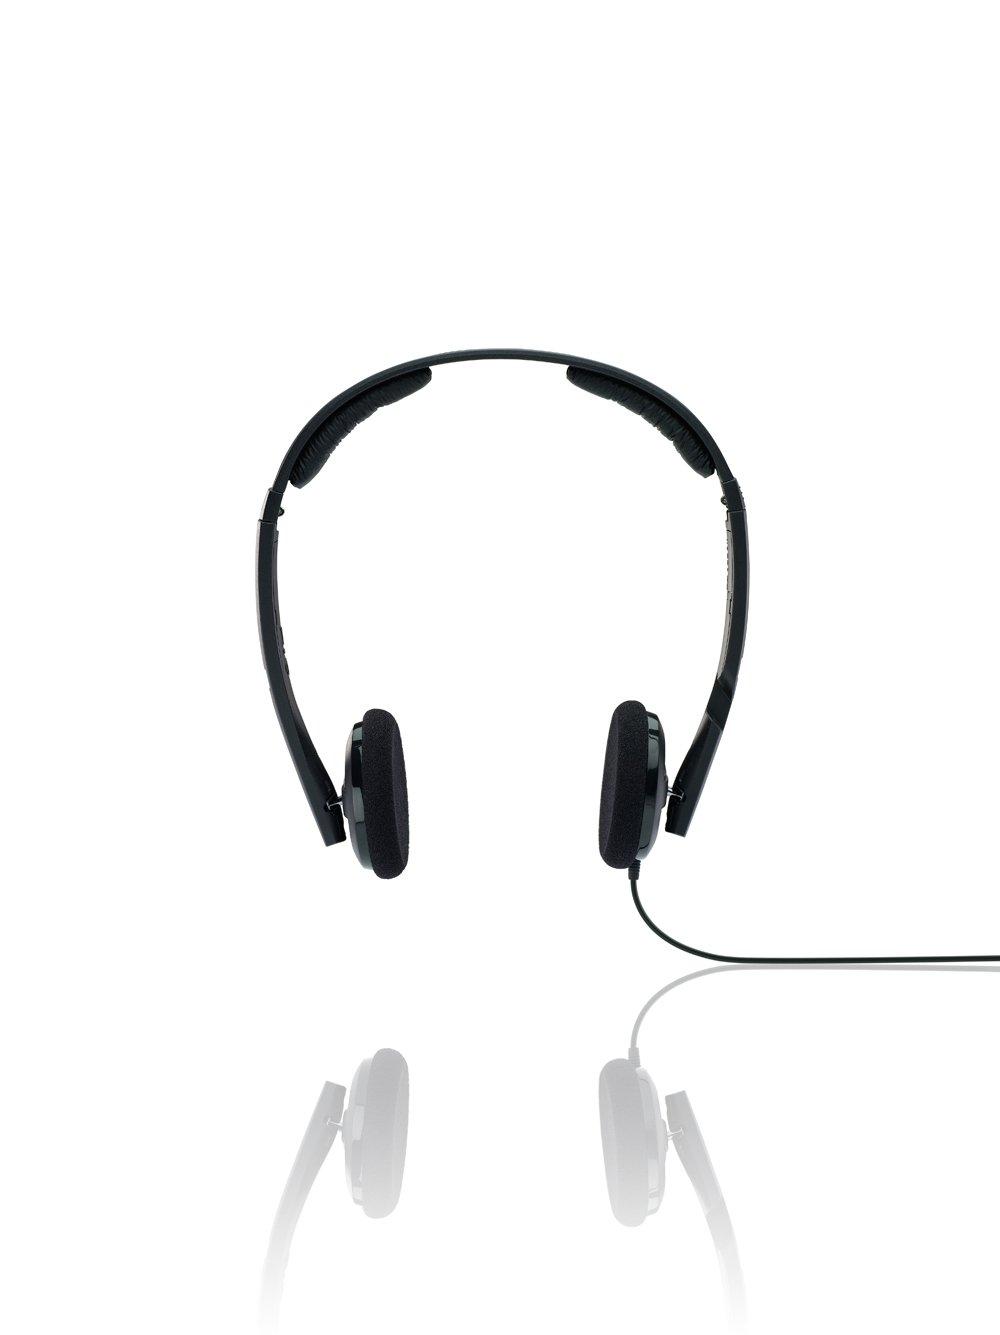 Sennheiser PX 100-II On Ear Miniheadphone (Black) by Sennheiser